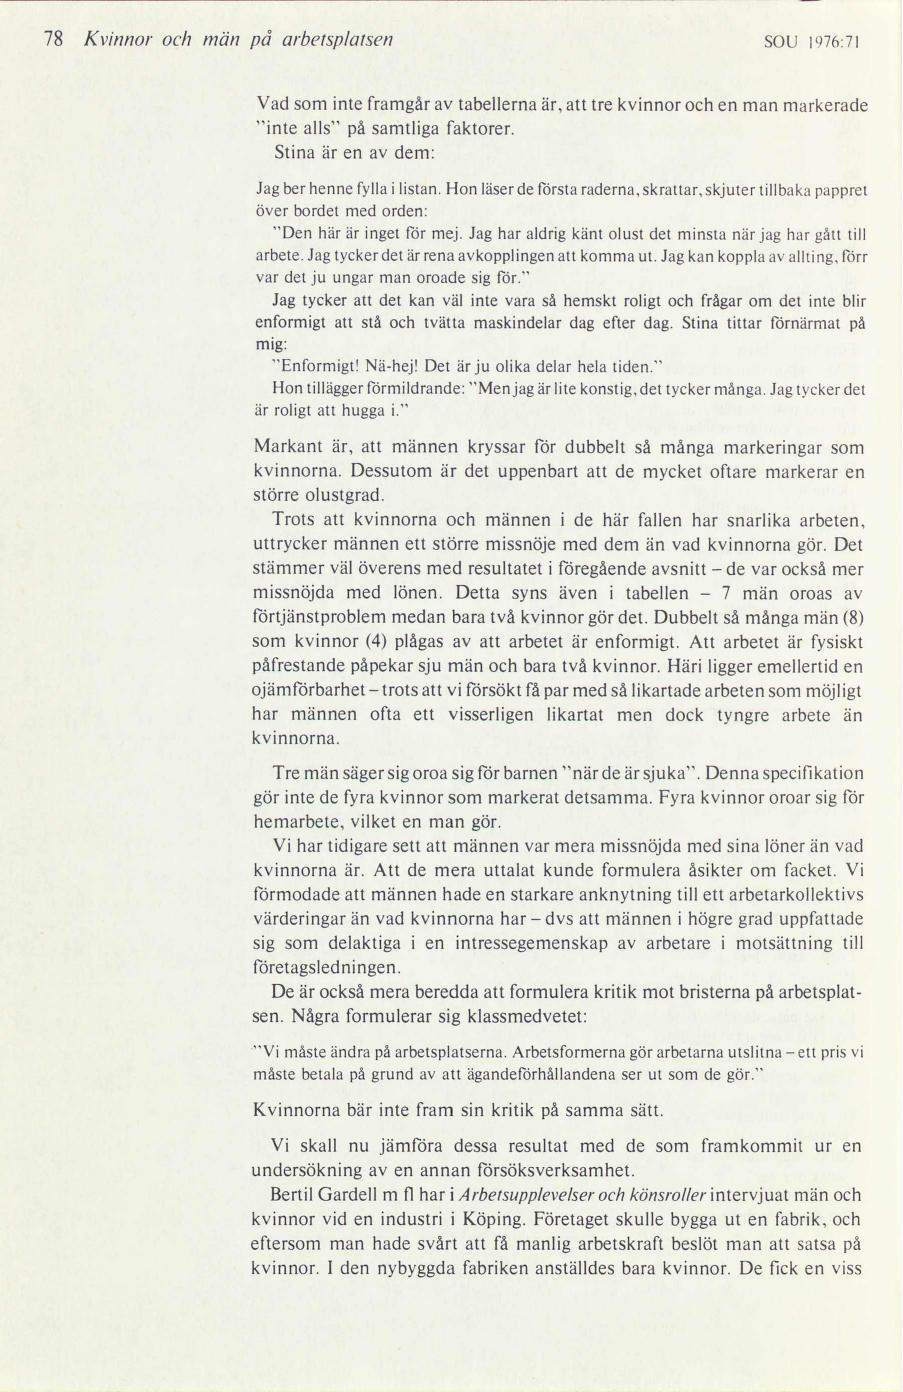 7bc363cdc5e8 Roller i omvandling : en rapport skriven på uppdrag av Delegationen ...